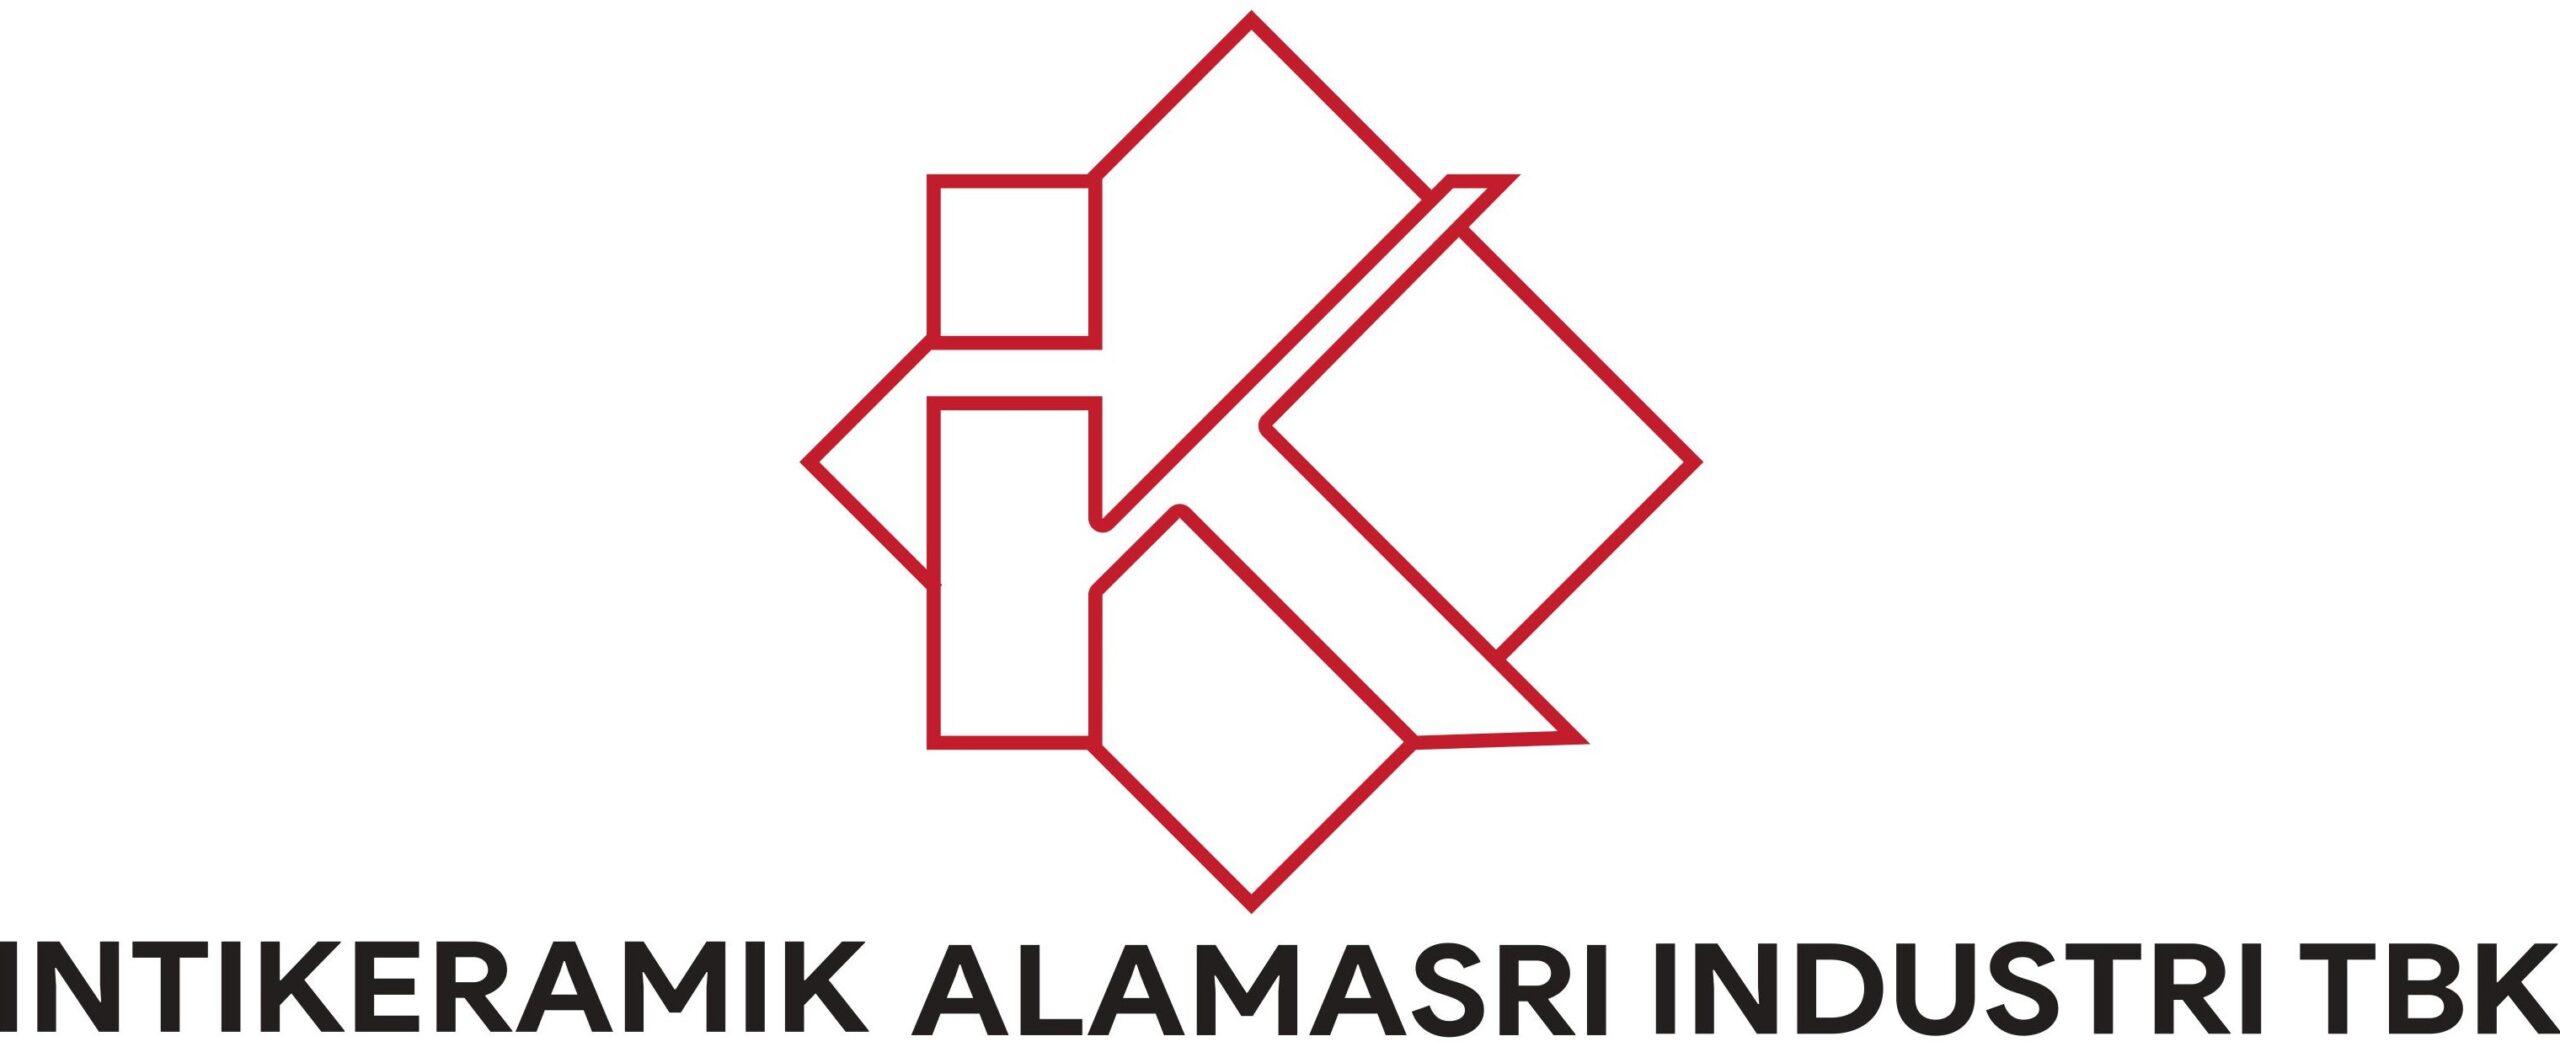 PT Intikeramik Alamasri Industri Tbk